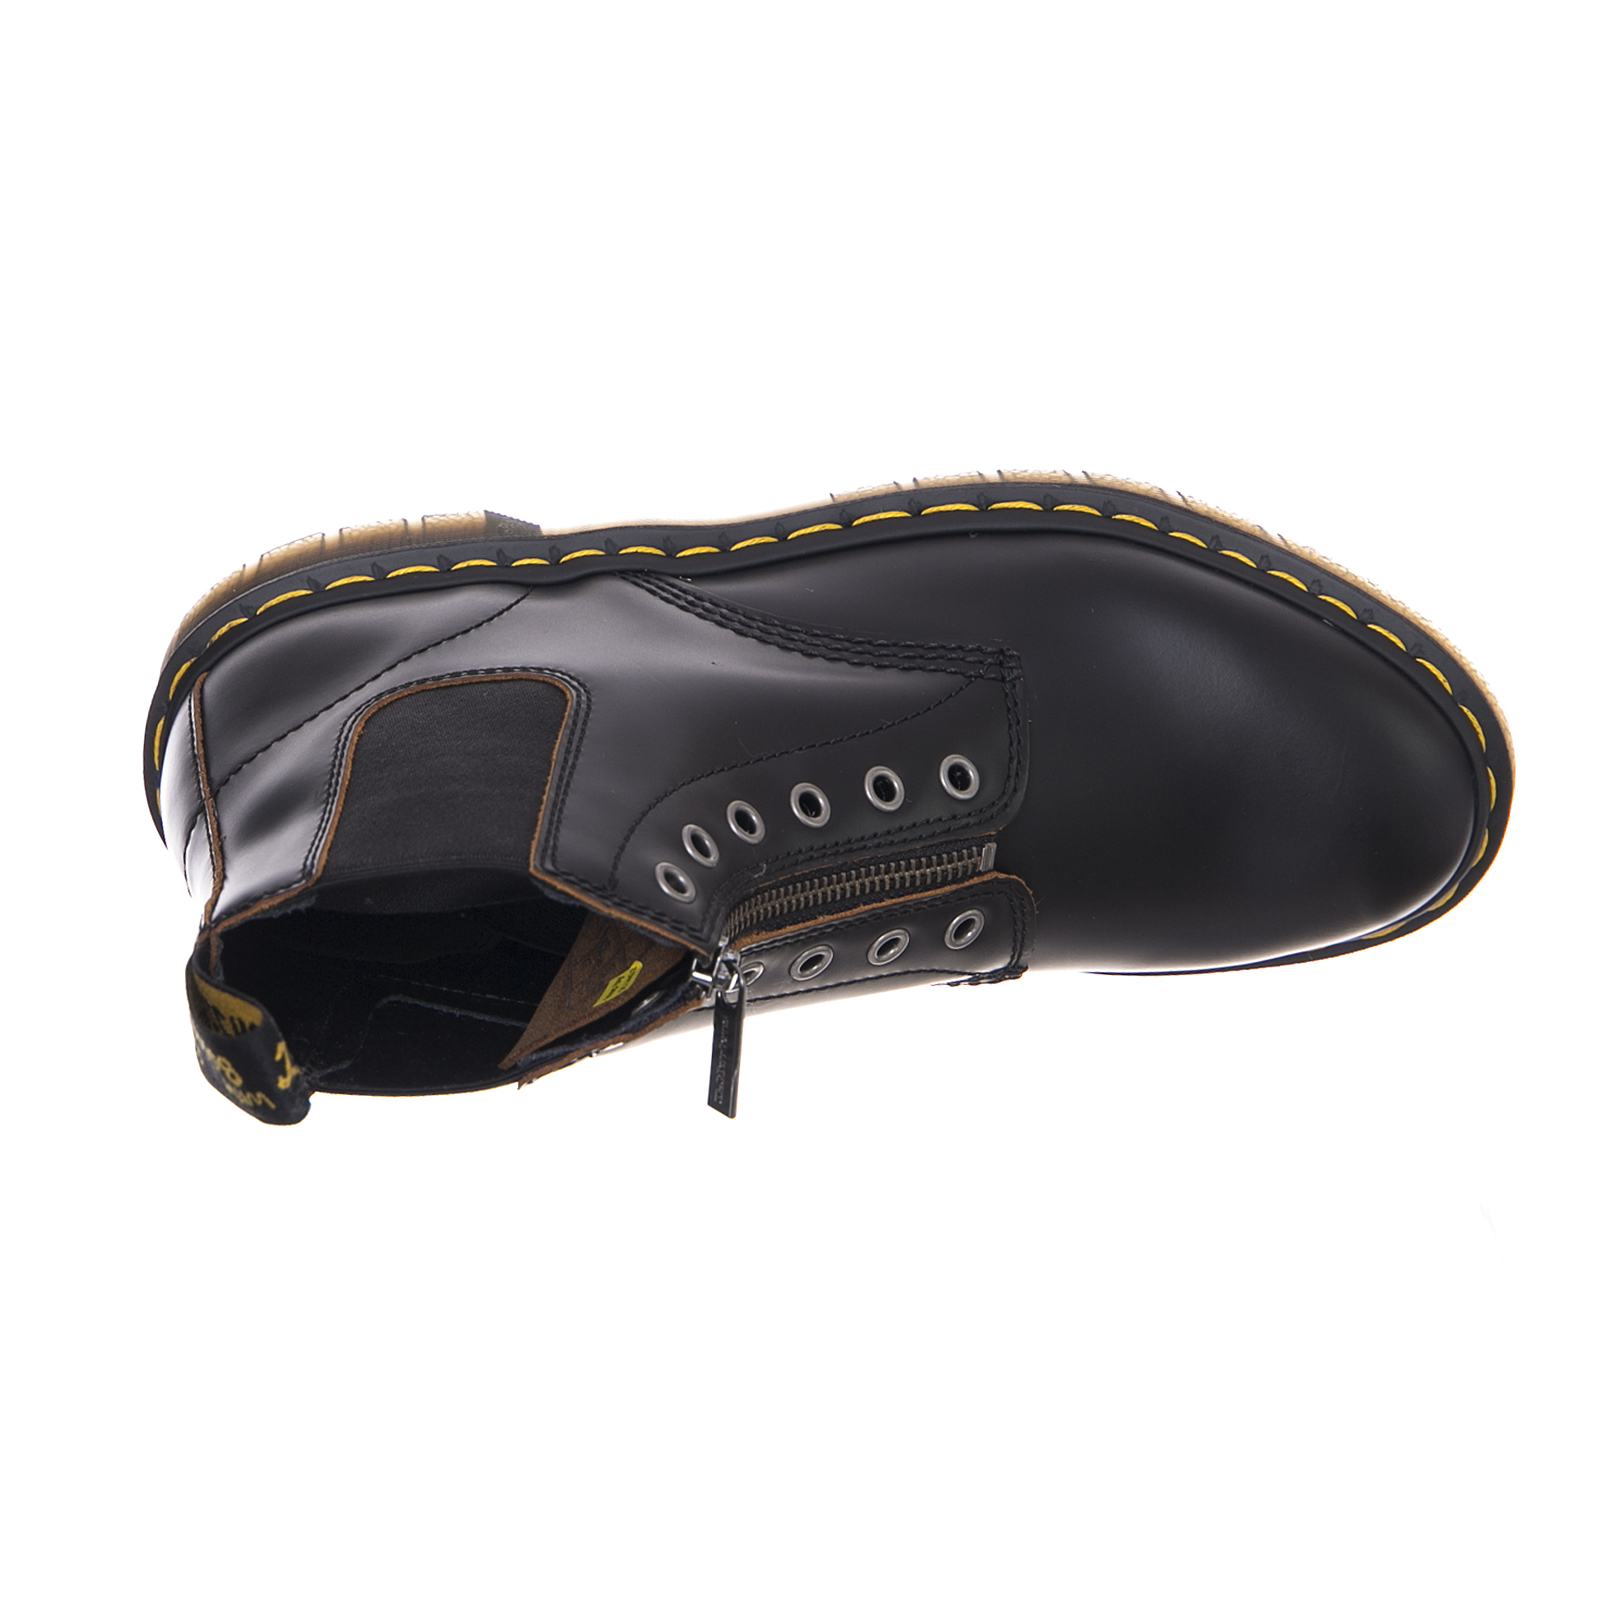 d0452f02 DR.MARTENS BOOTS 101 Gst Black Vintage Smooth Black - $187.37 | PicClick